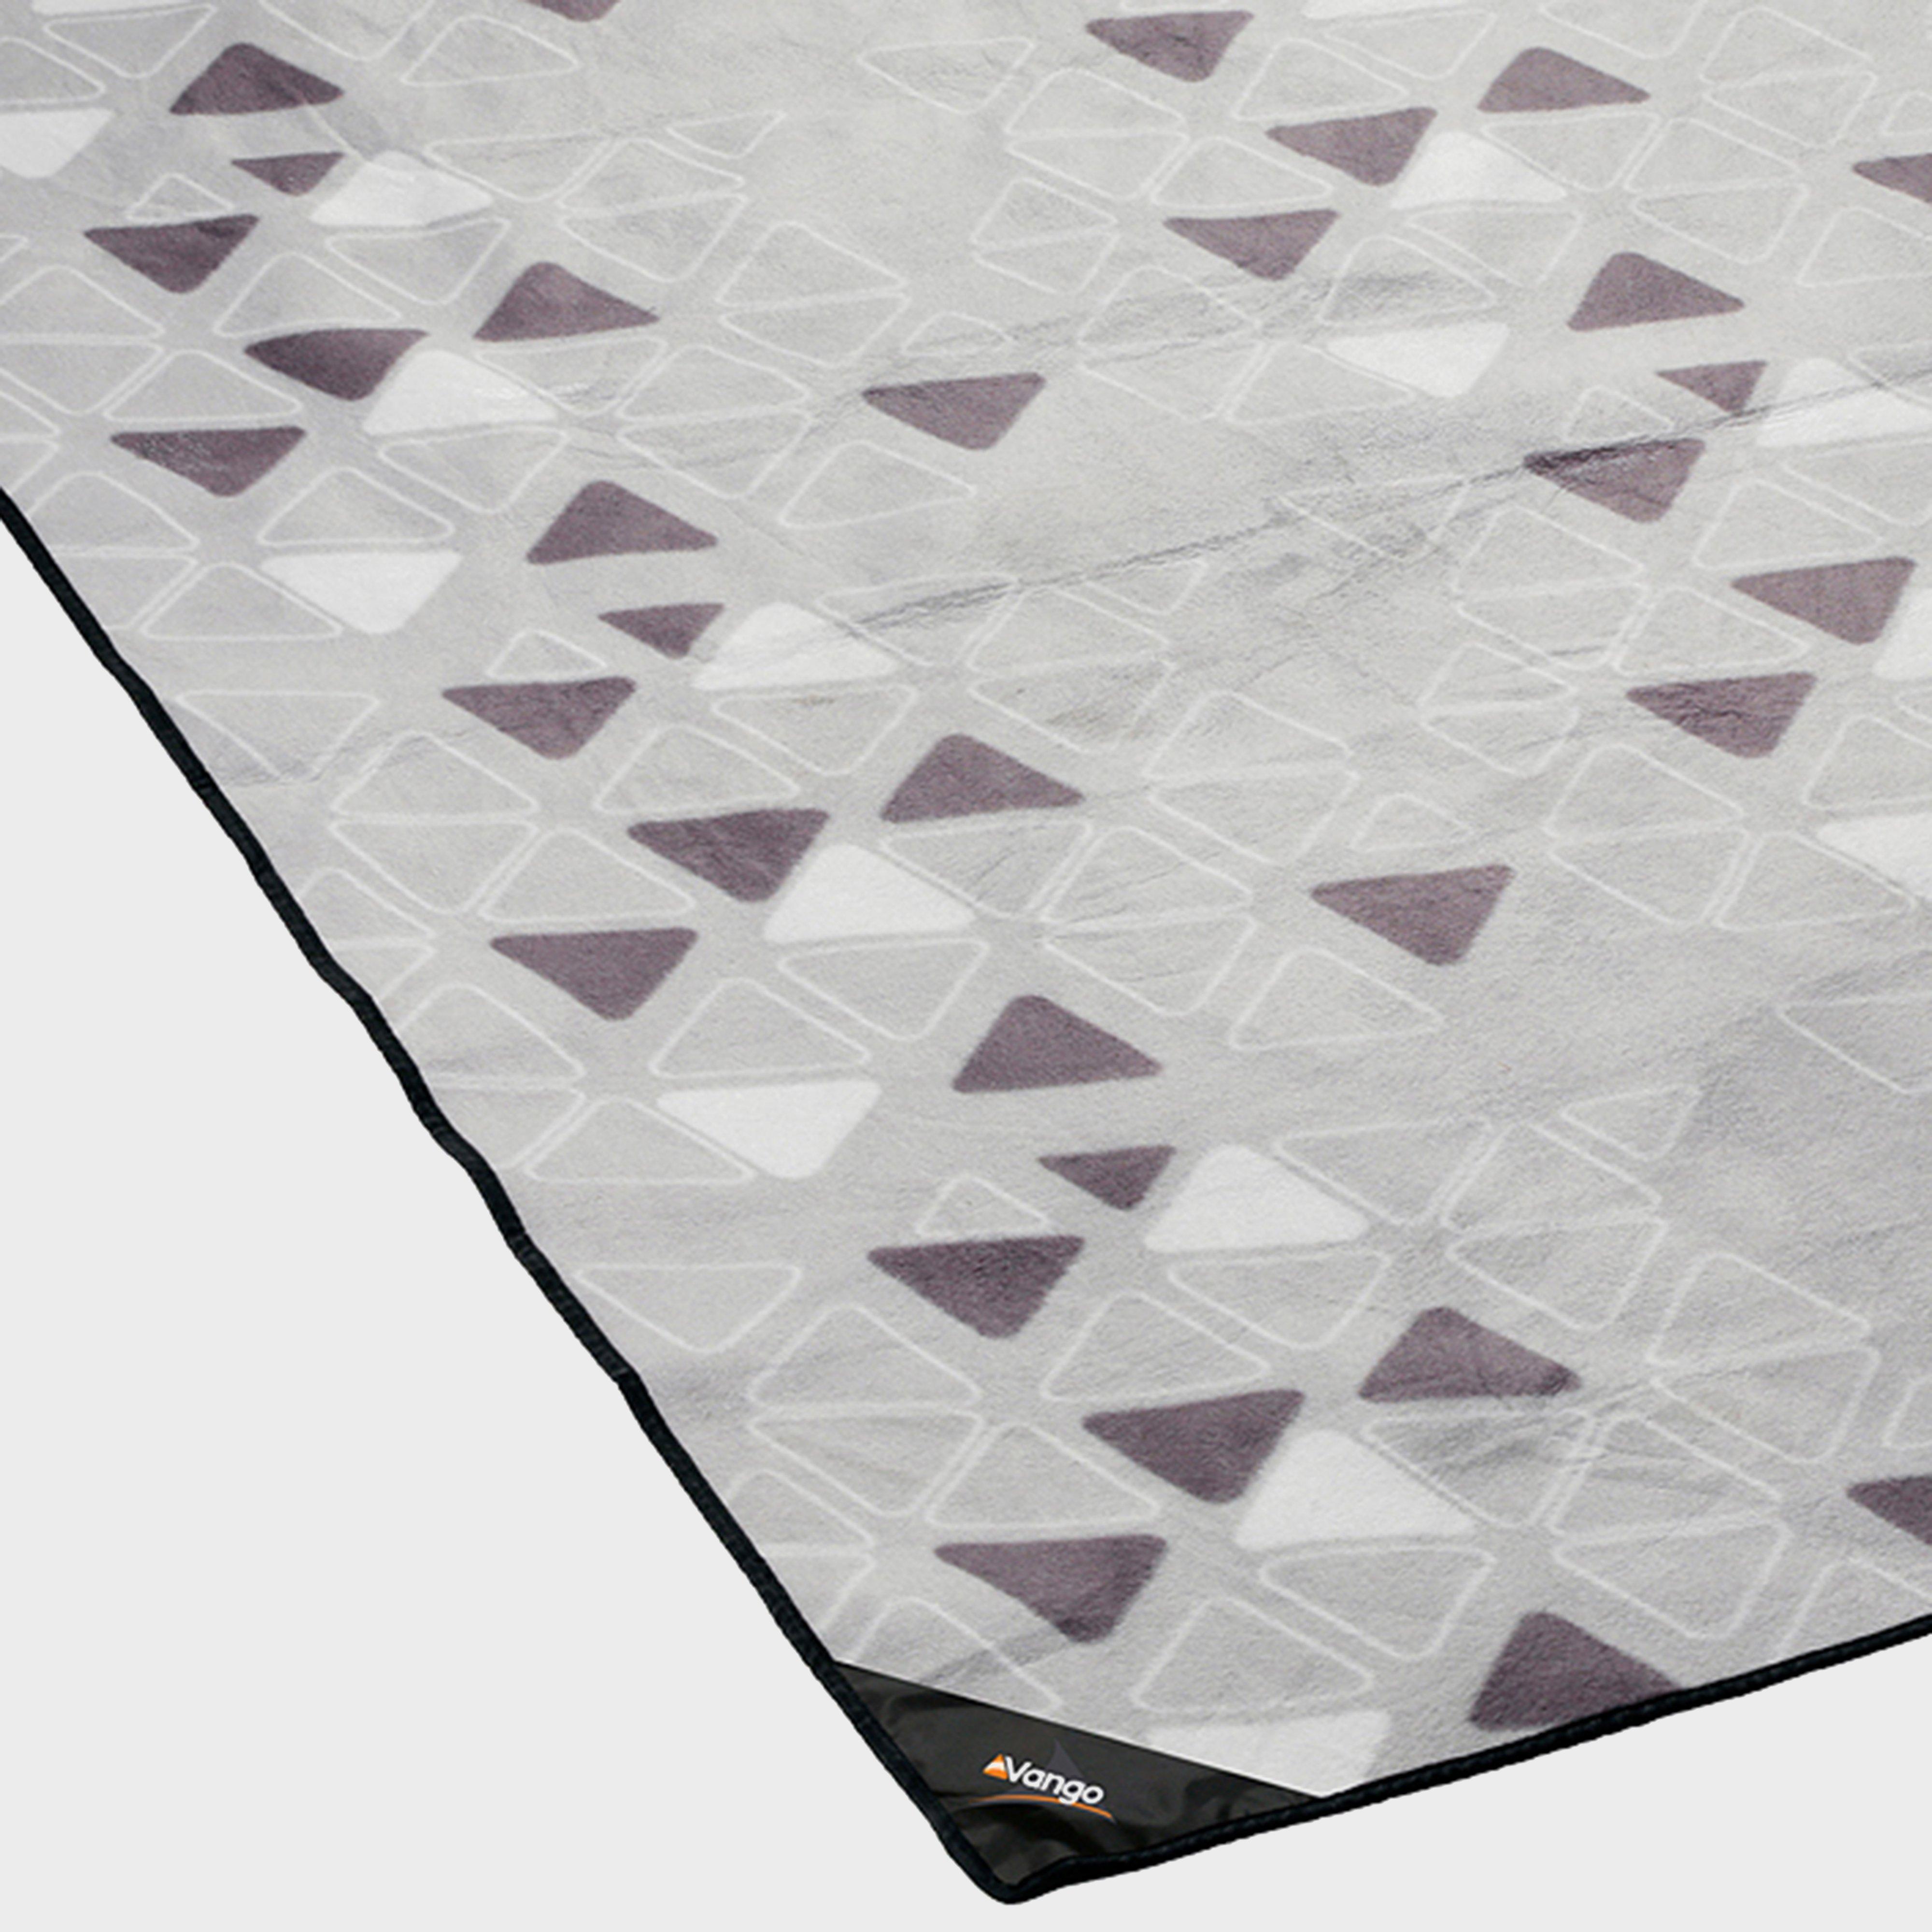 Vango Anteus 600 Carpet - Grey/carpet  Grey/carpet